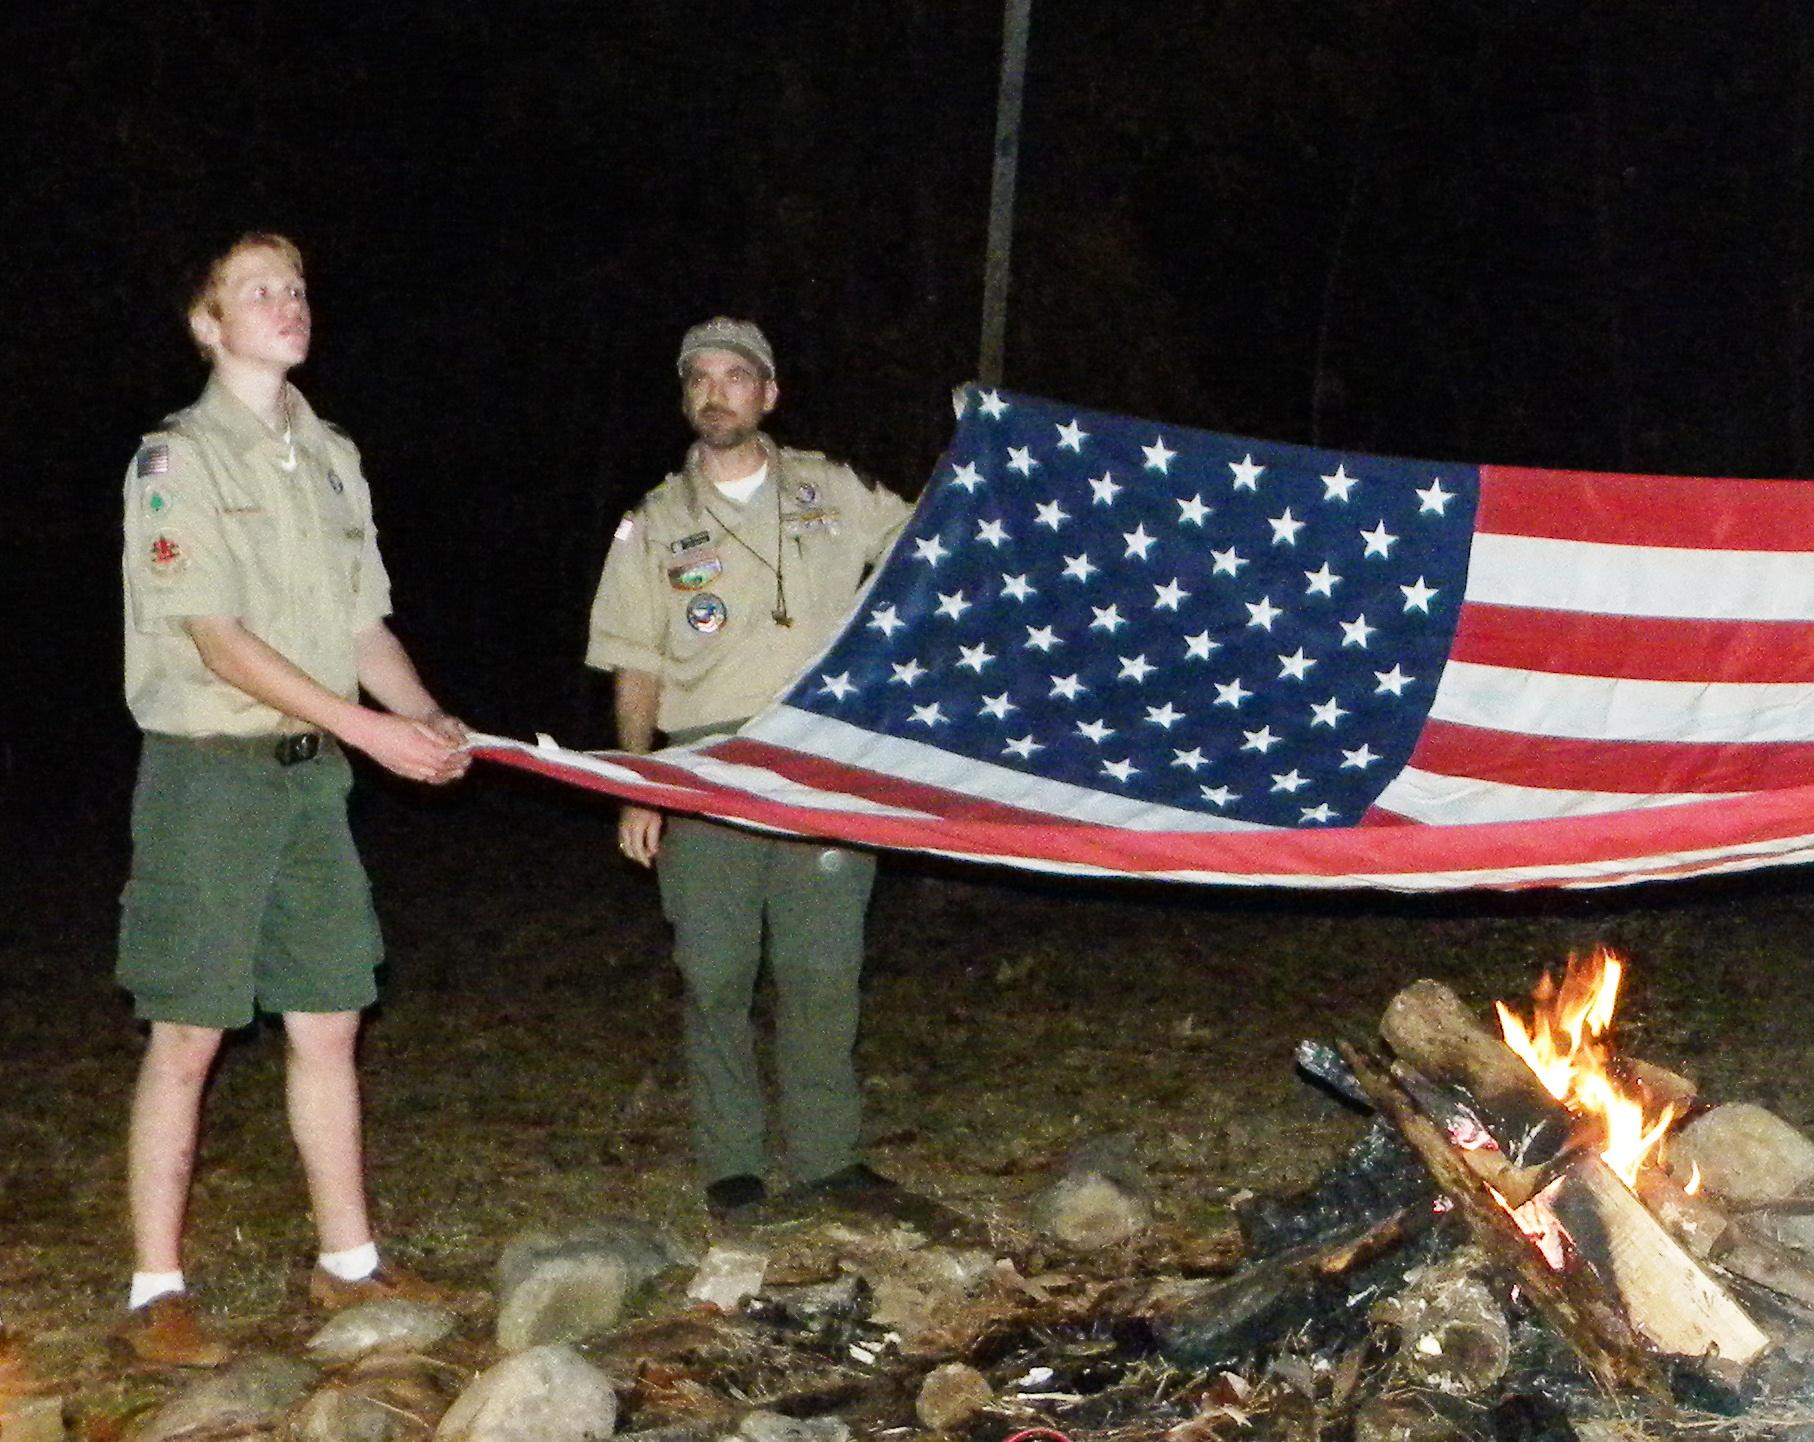 Troop 149 US Flag Retirement Ceremony